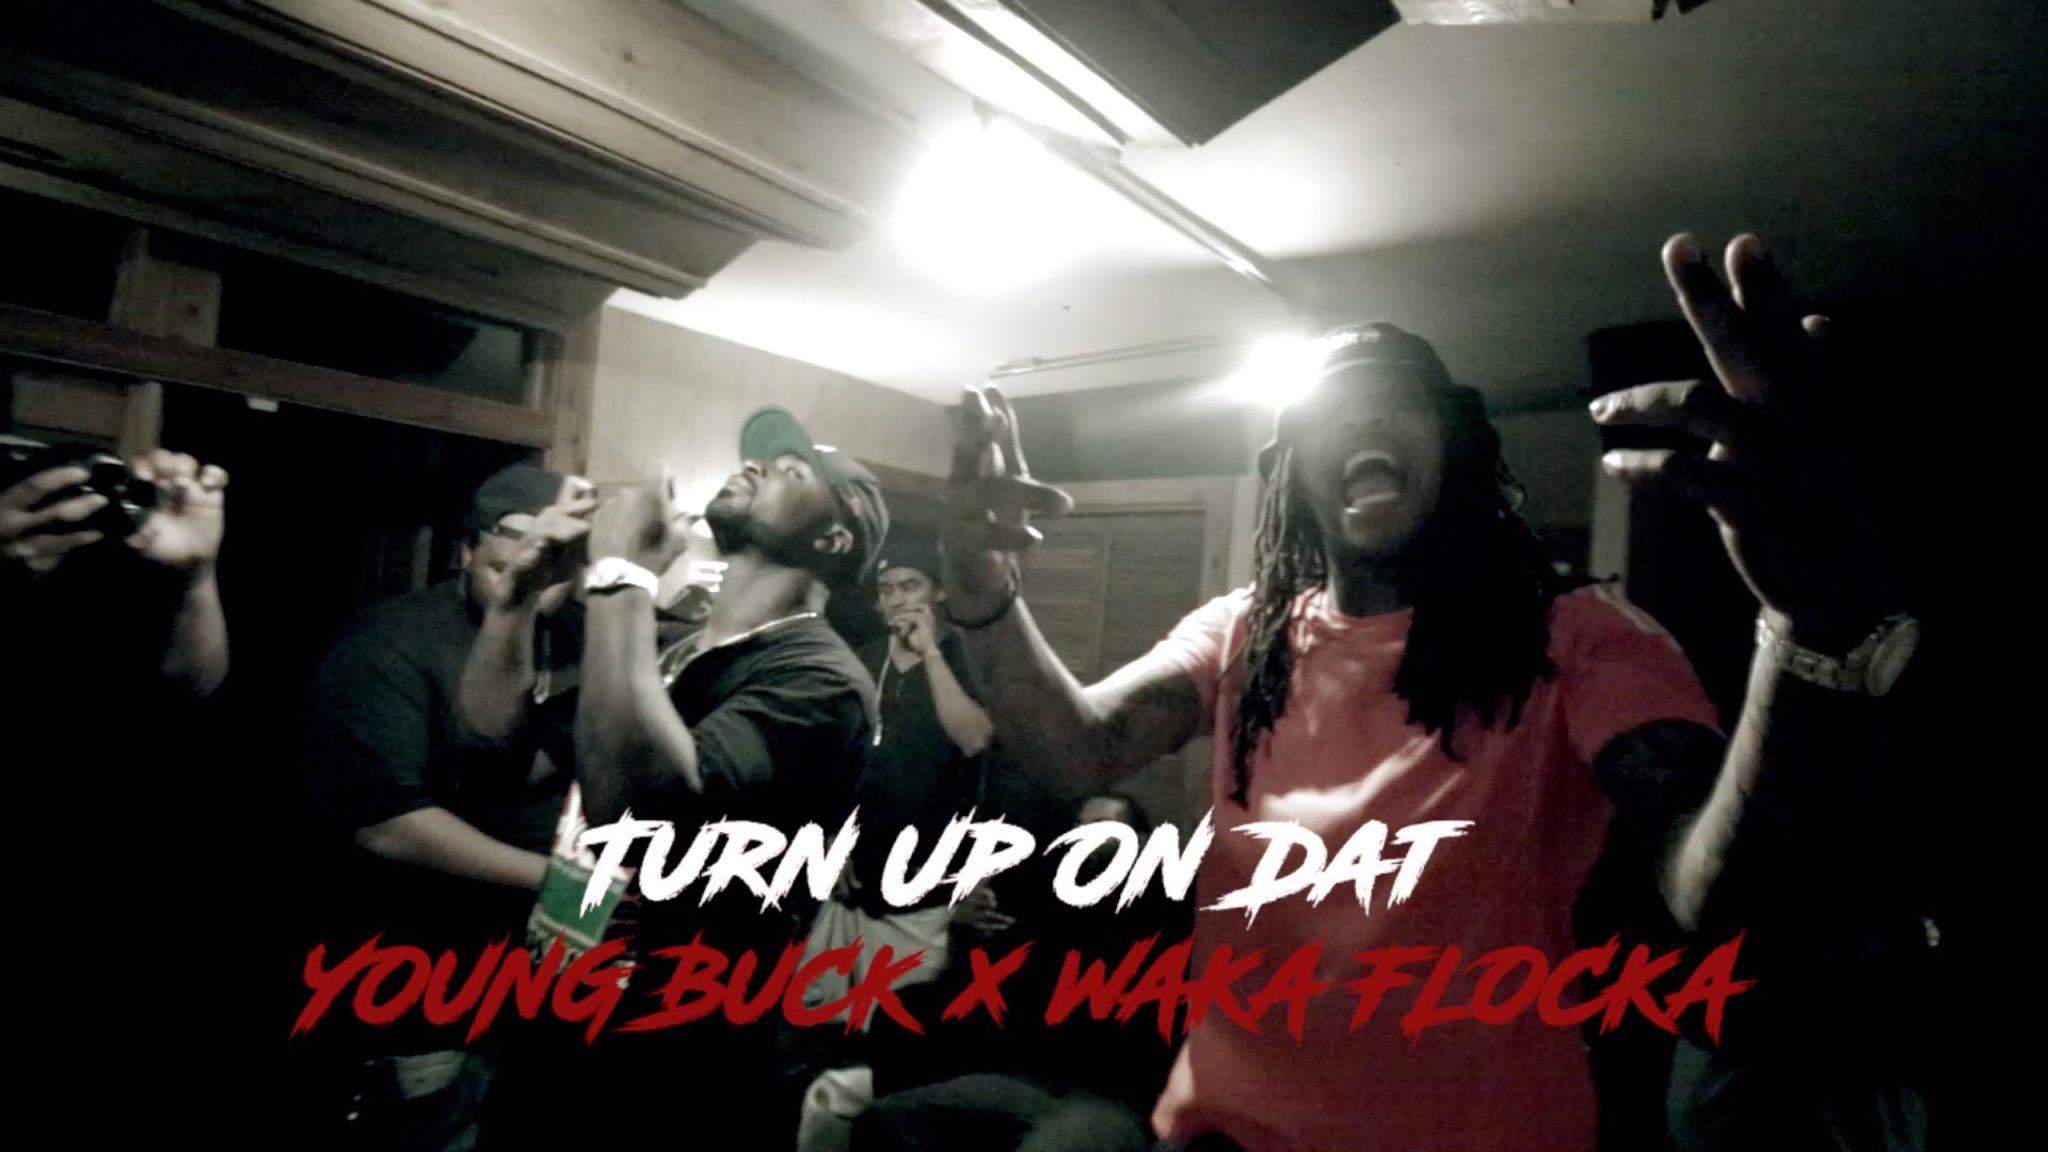 Young Buck Waka Flocka Turn Up On Dat